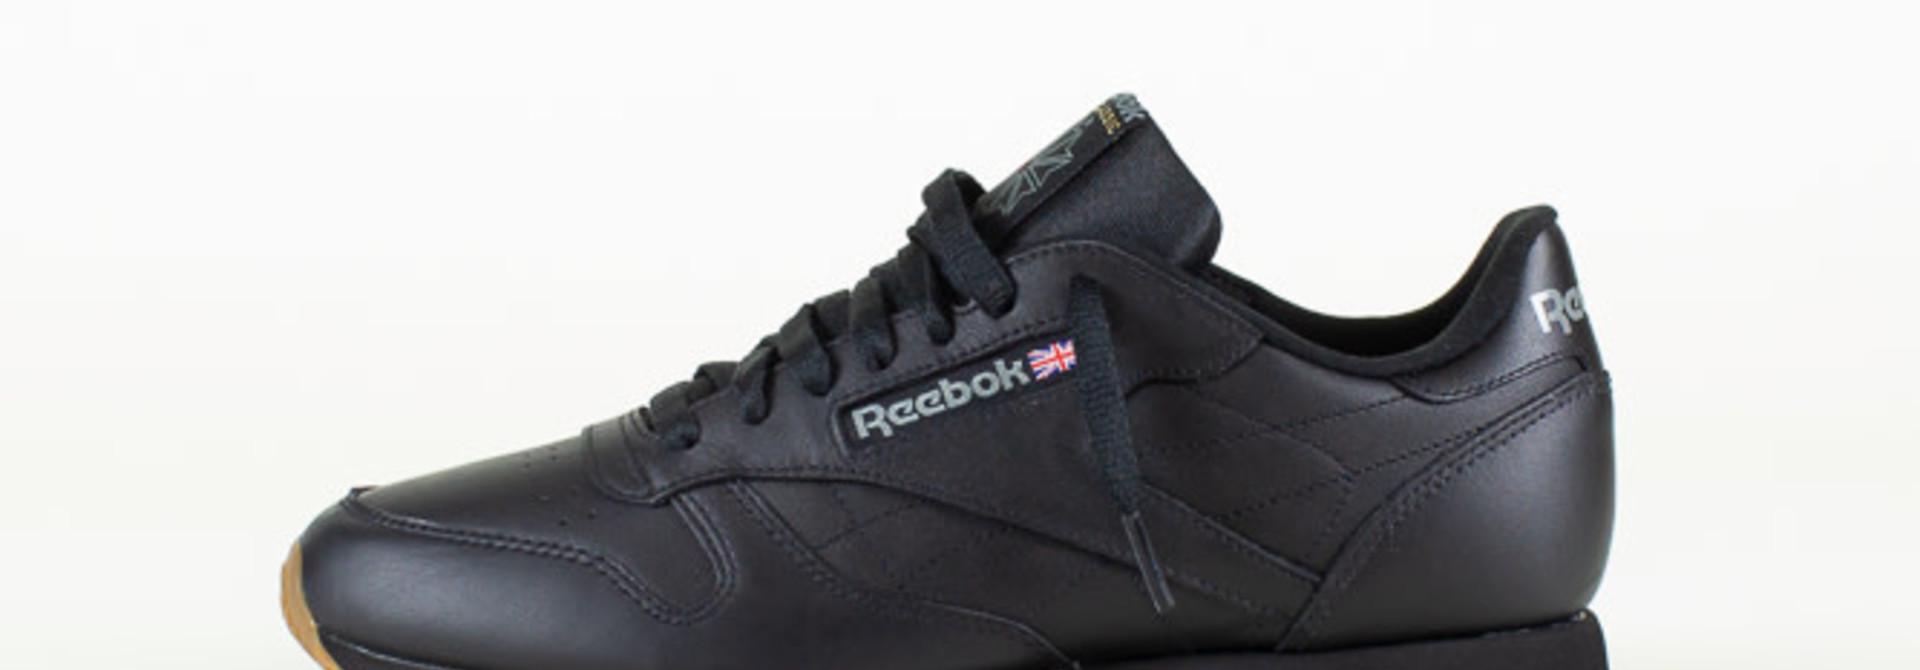 Reebok Classic Leather - Black/Gum